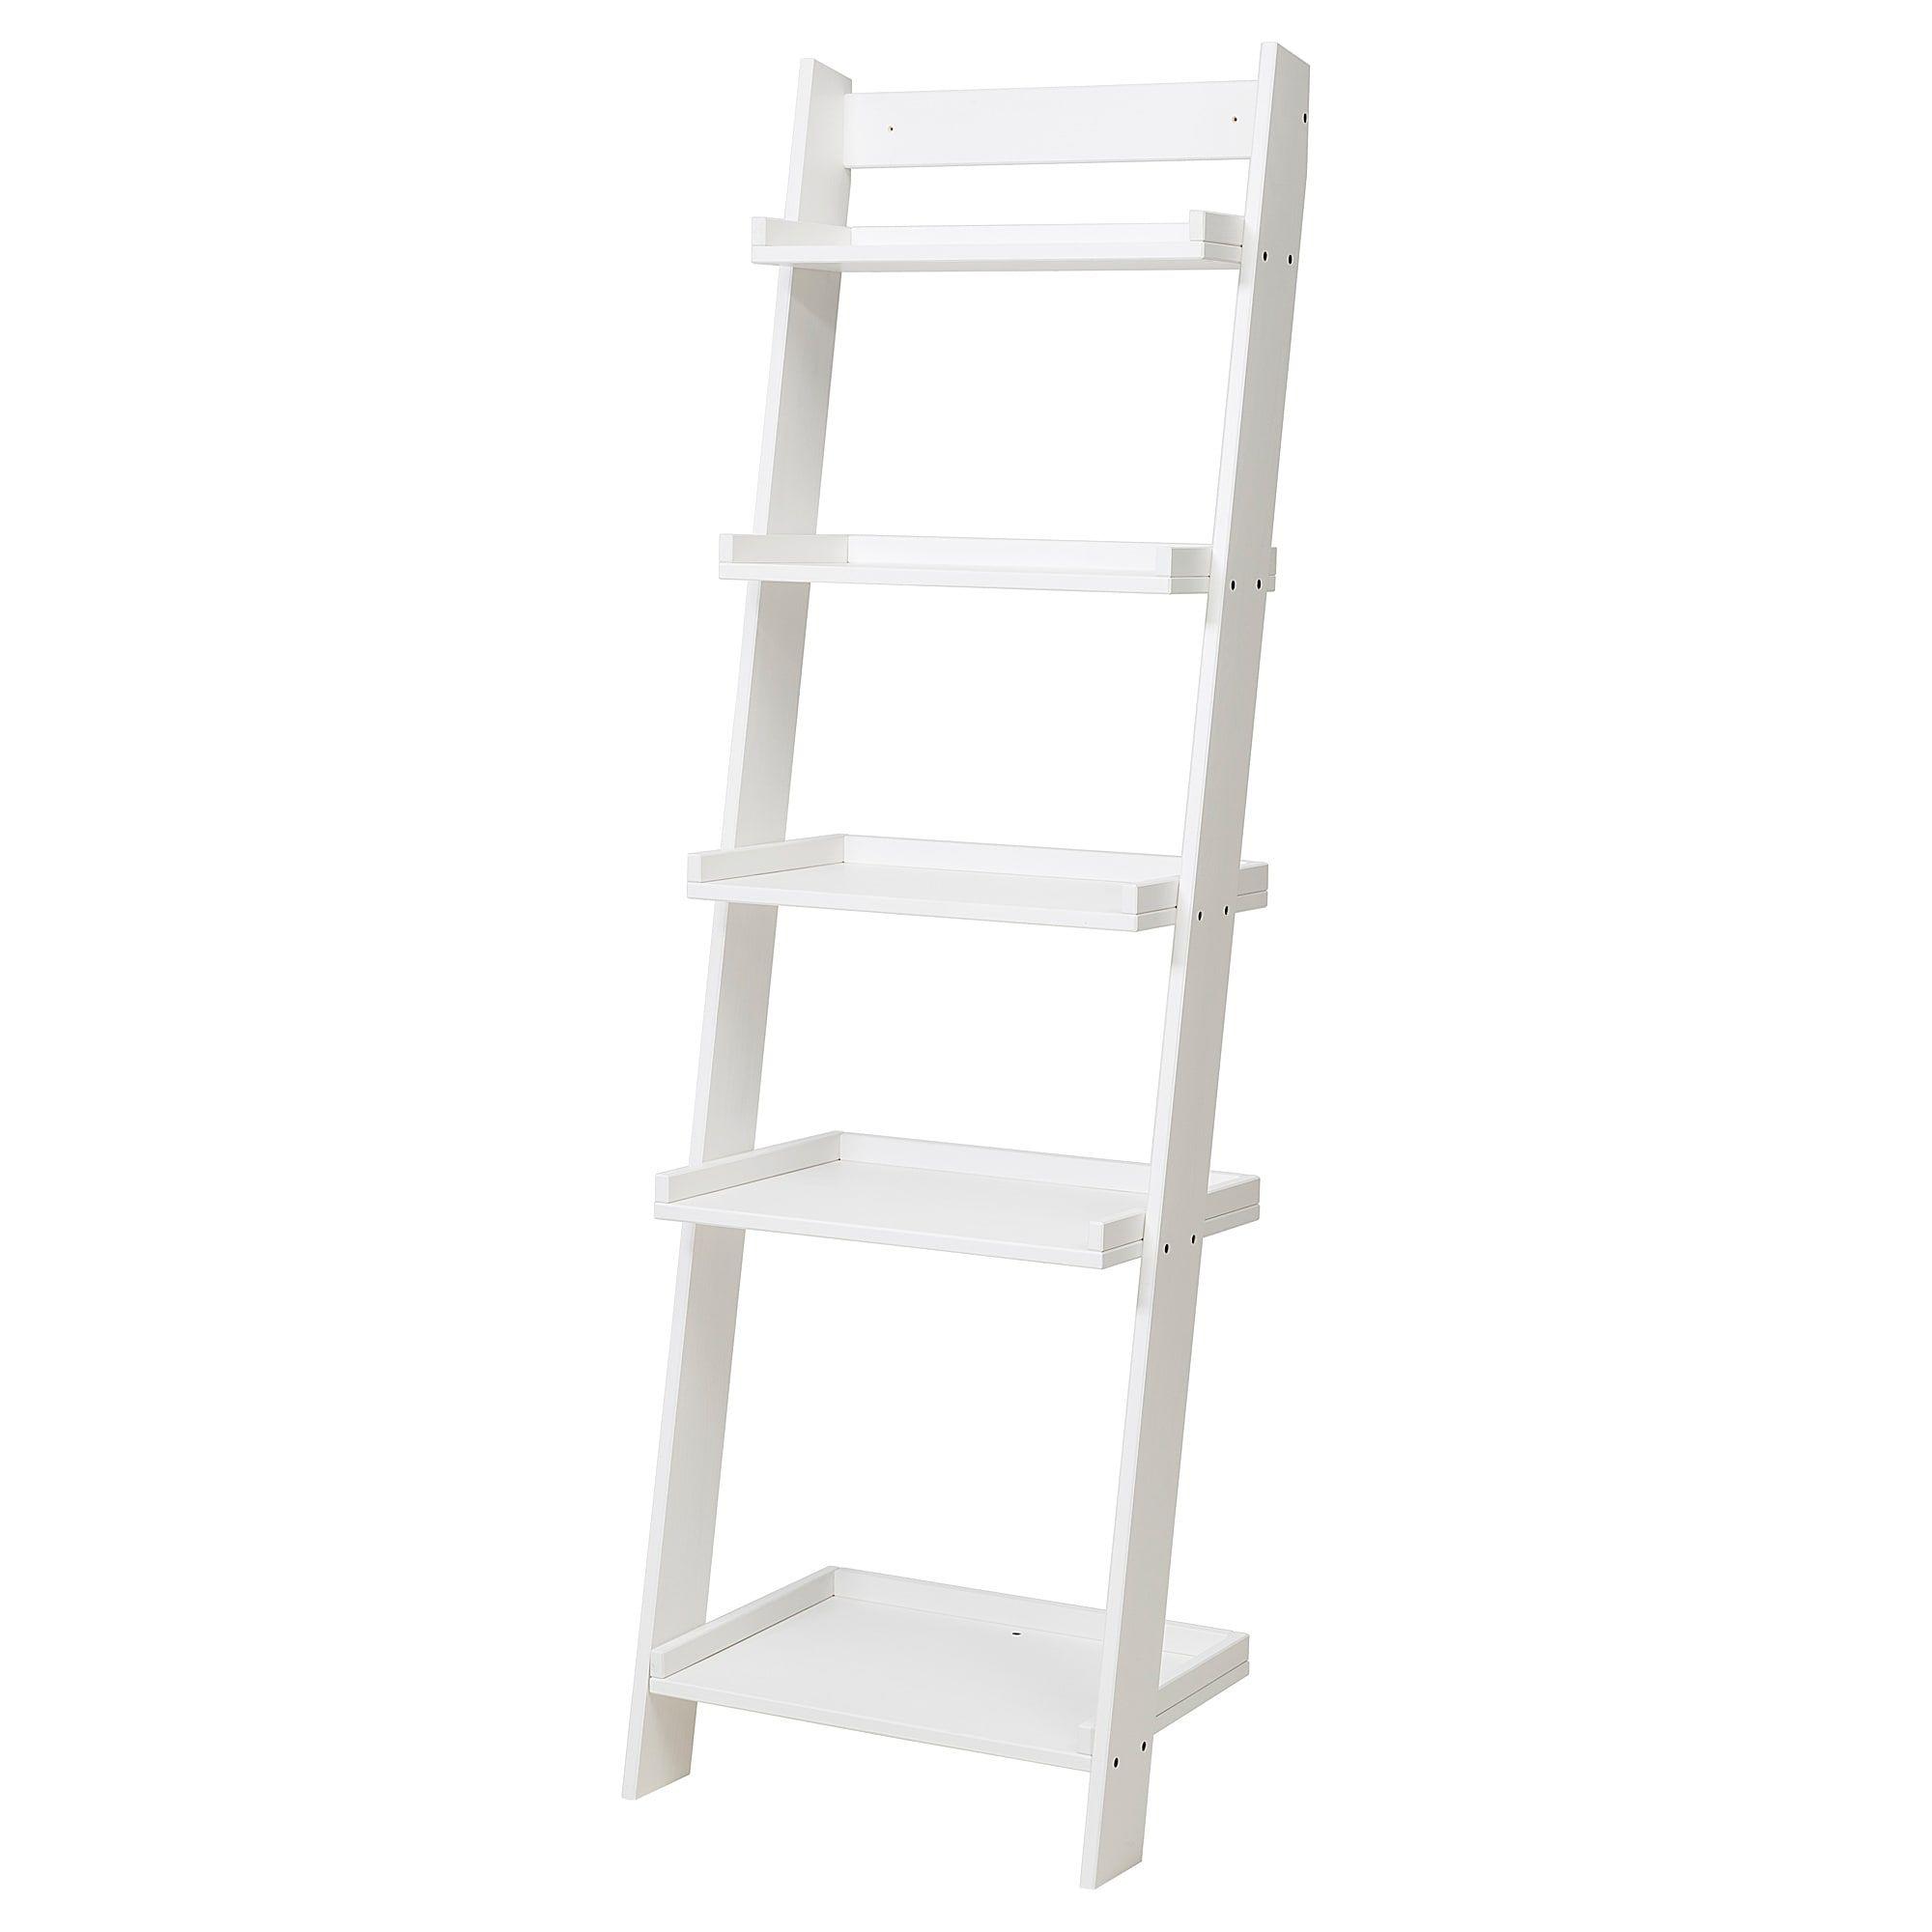 Hoghem Wall Shelf White 22 1 2x73 5 8 Wall Shelves Diy Wall